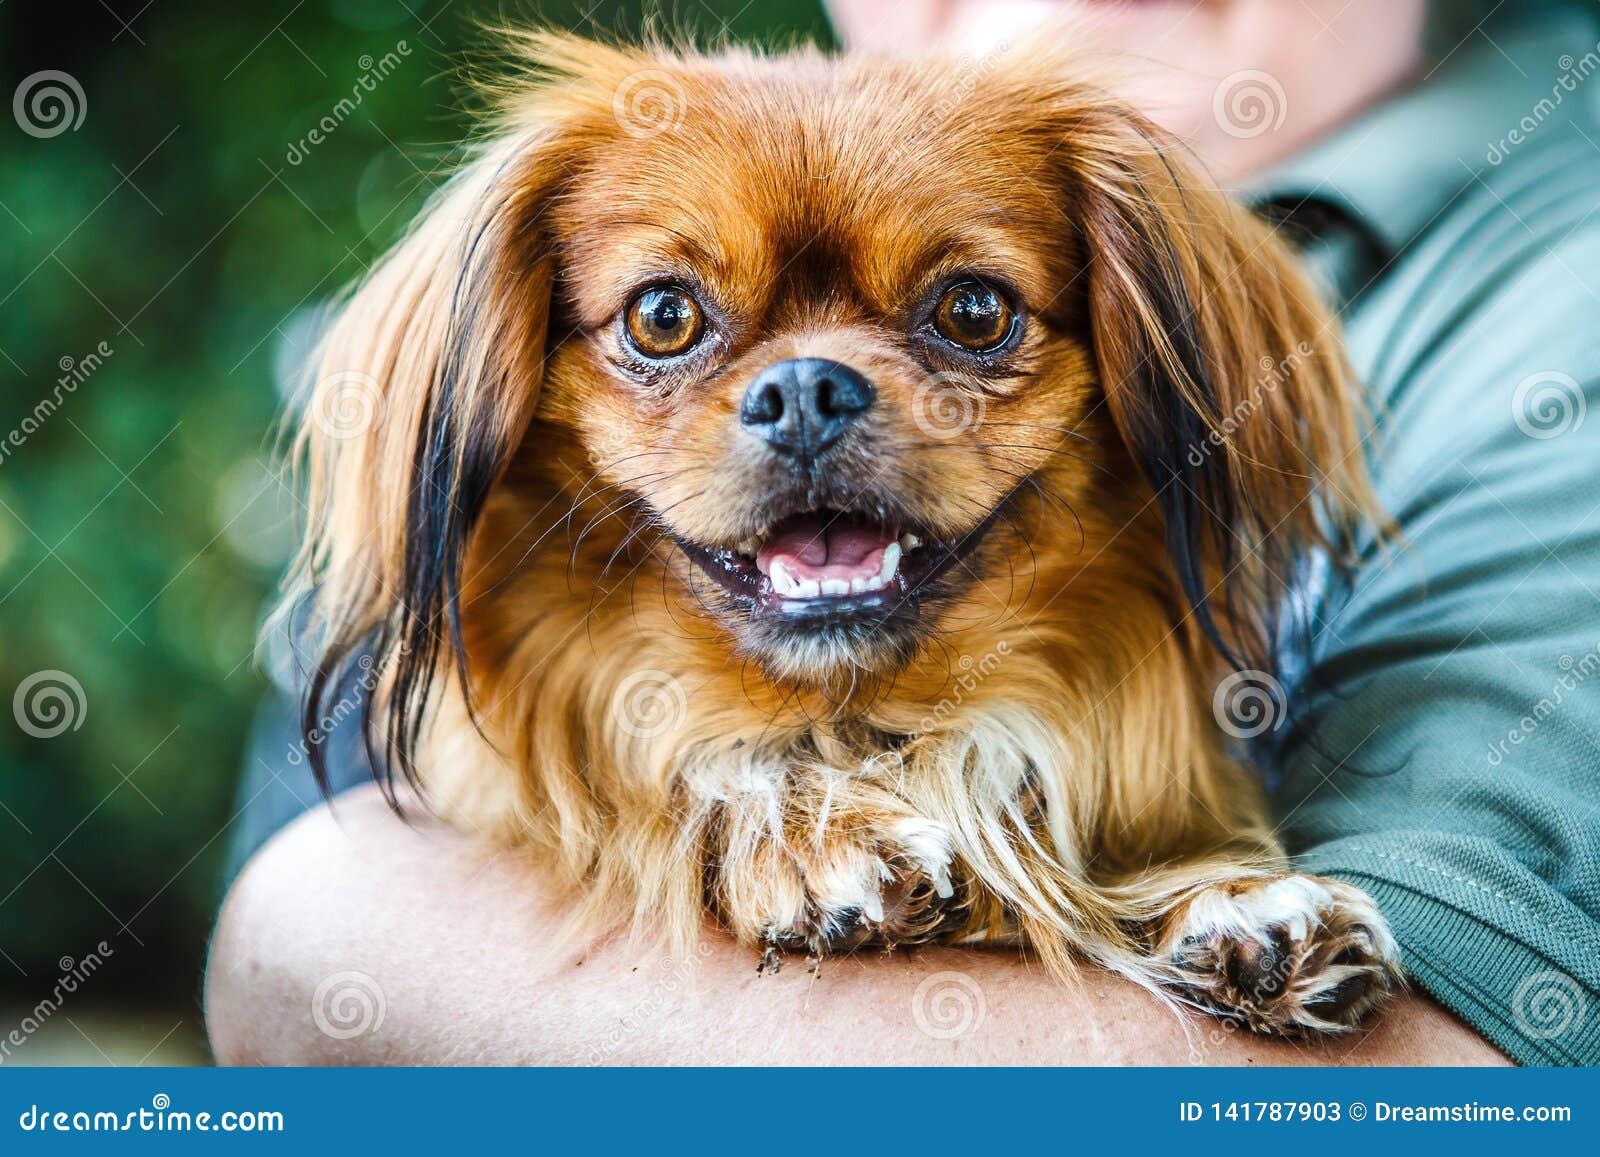 Small brown pekingese dog